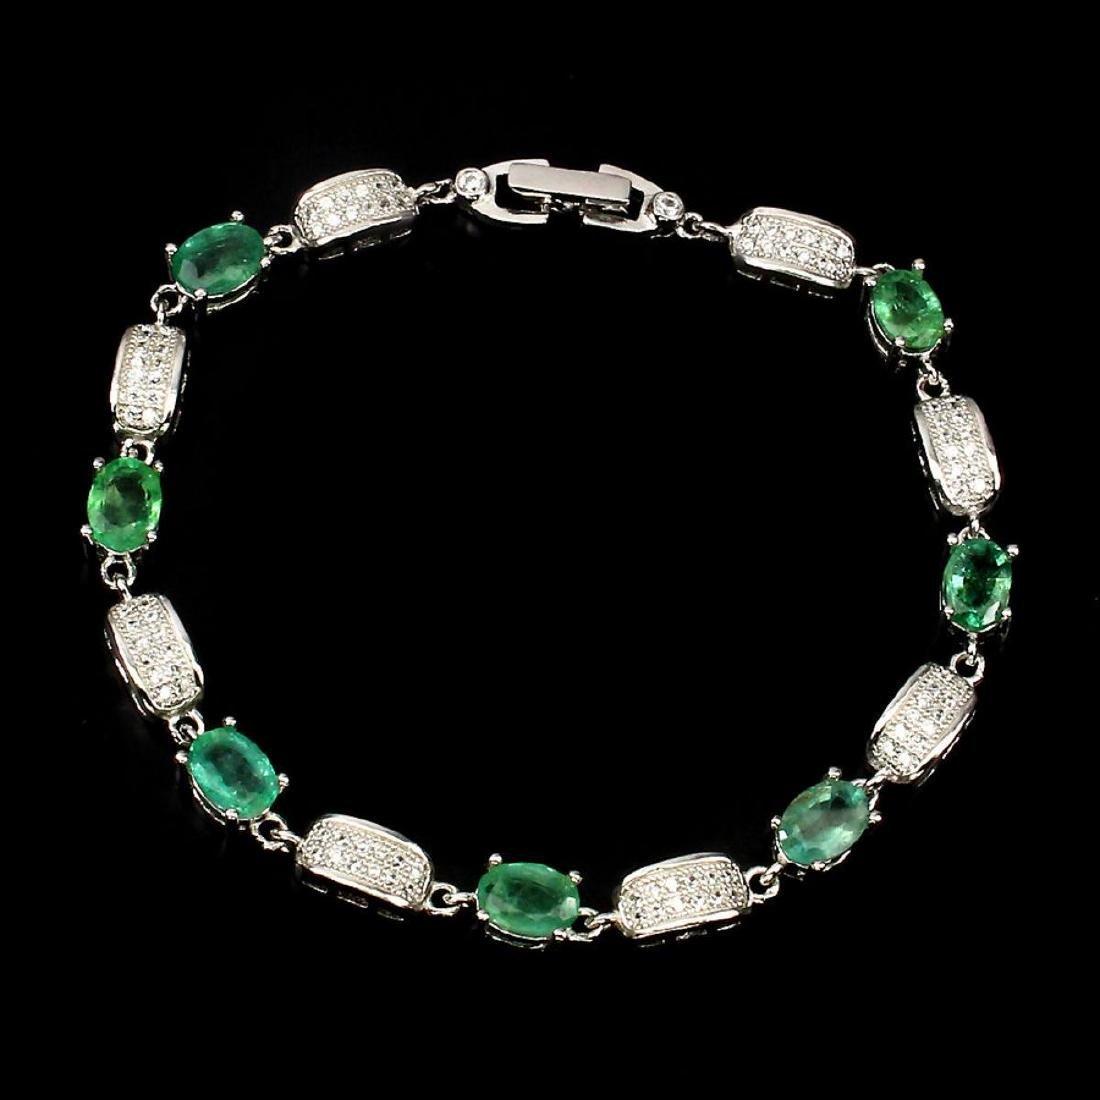 Natural Green Emerald 59 carats Bracelet